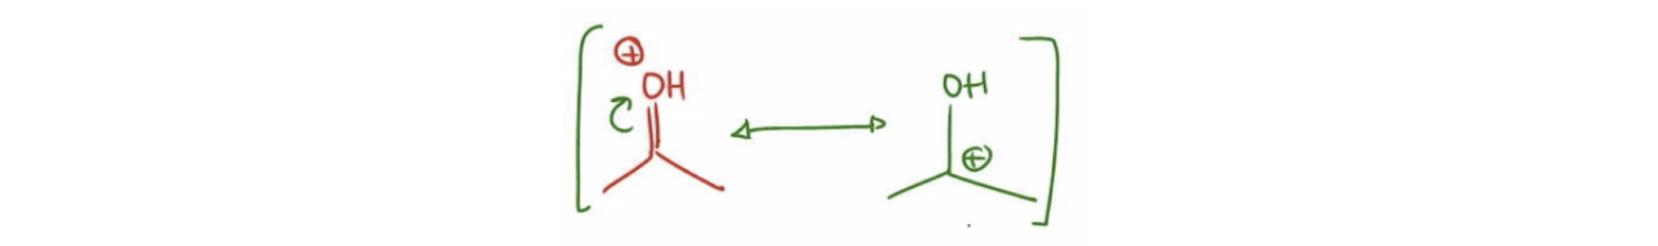 Resonance-Structures